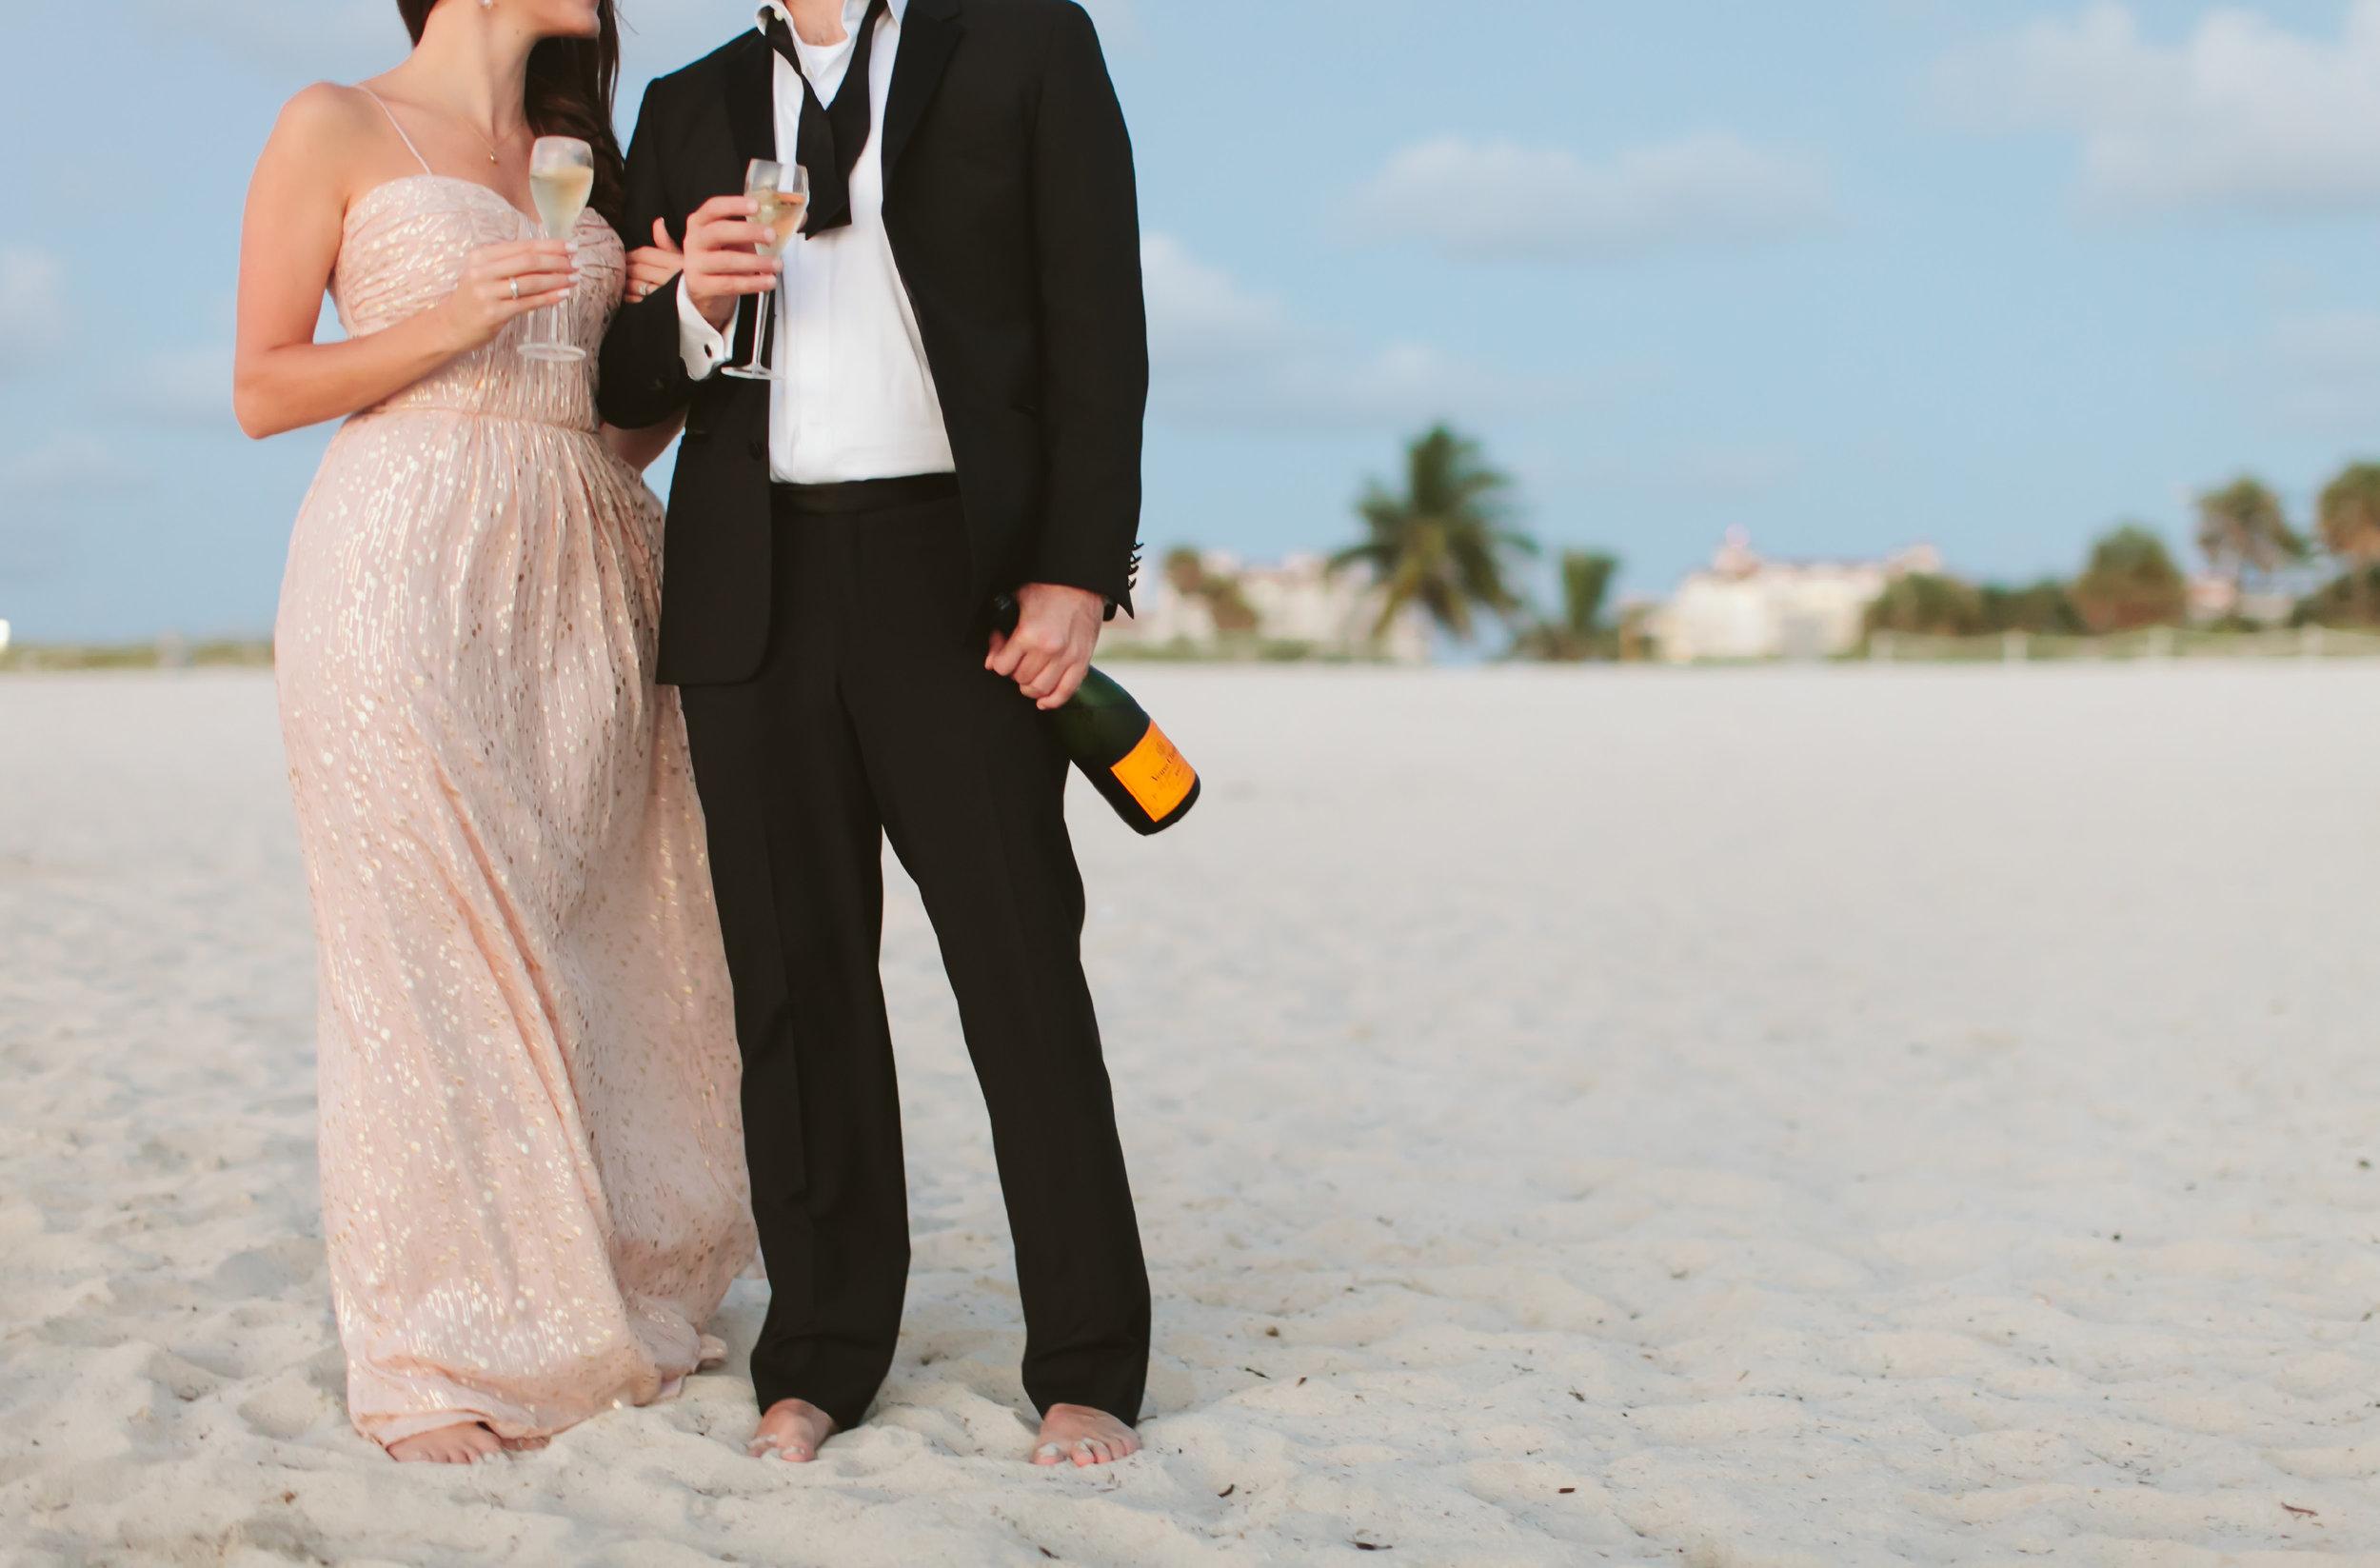 Meli + Mike South Pointe Park South Beach Miami Engagement Shoot8.jpg